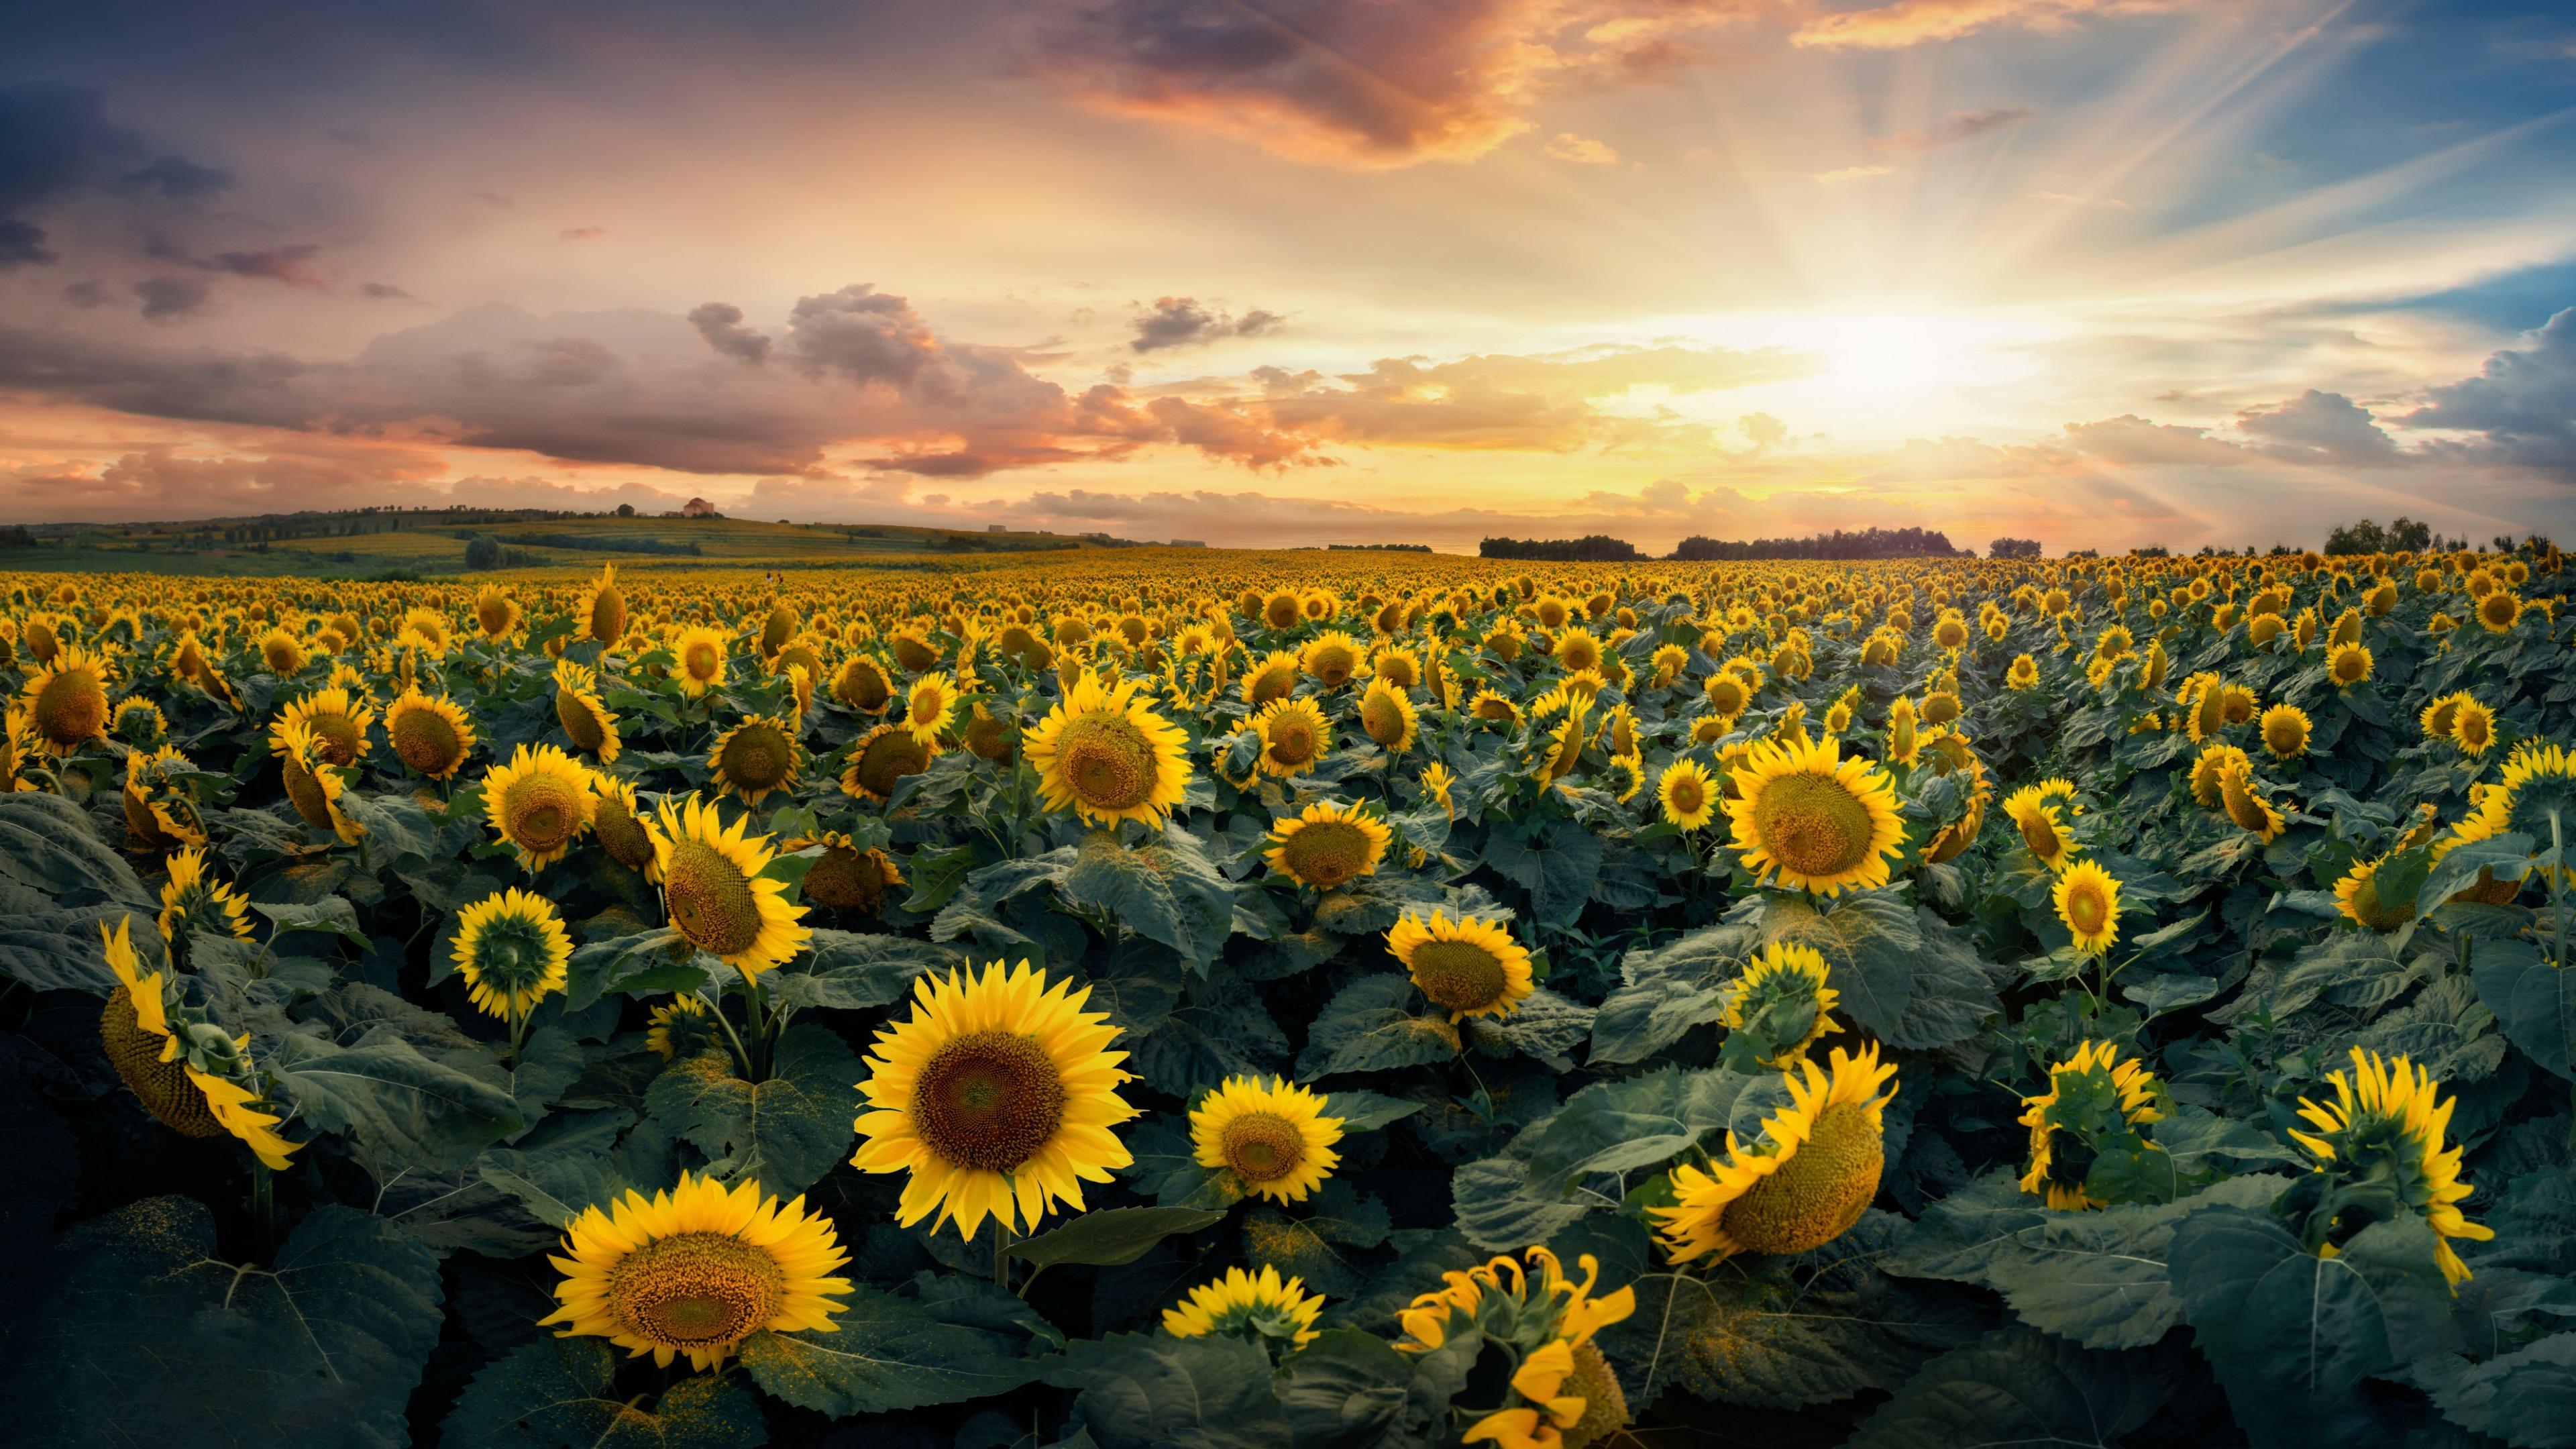 Sunflower sea wallpaper